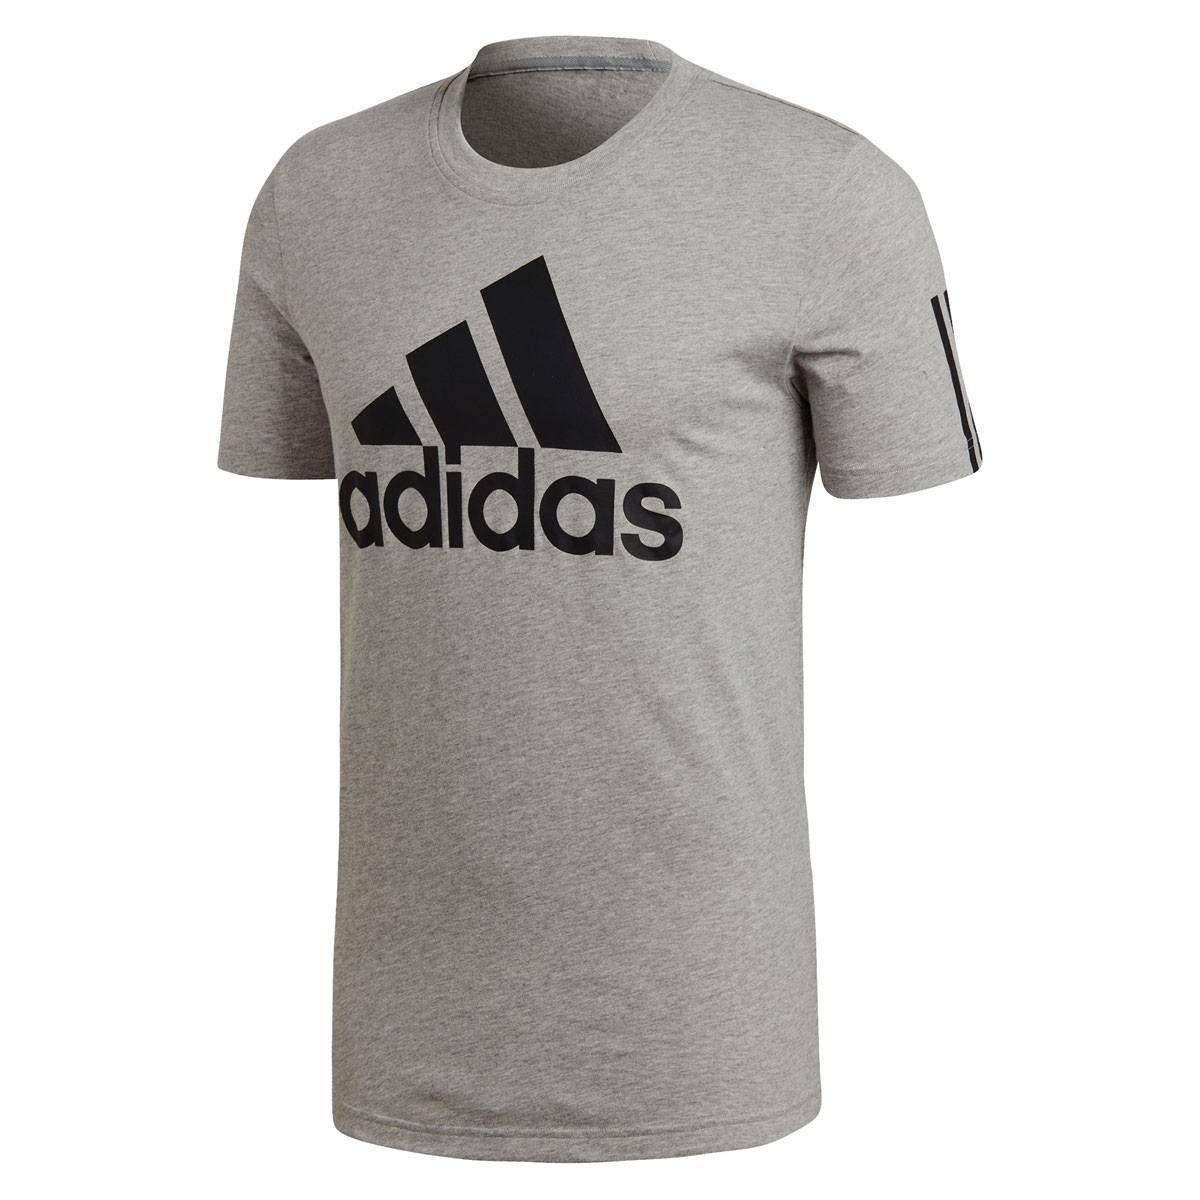 c7aeacc74c48d2 adidas Sport Id Logo Tee - Fitness tops for Men - Grey | 21RUN